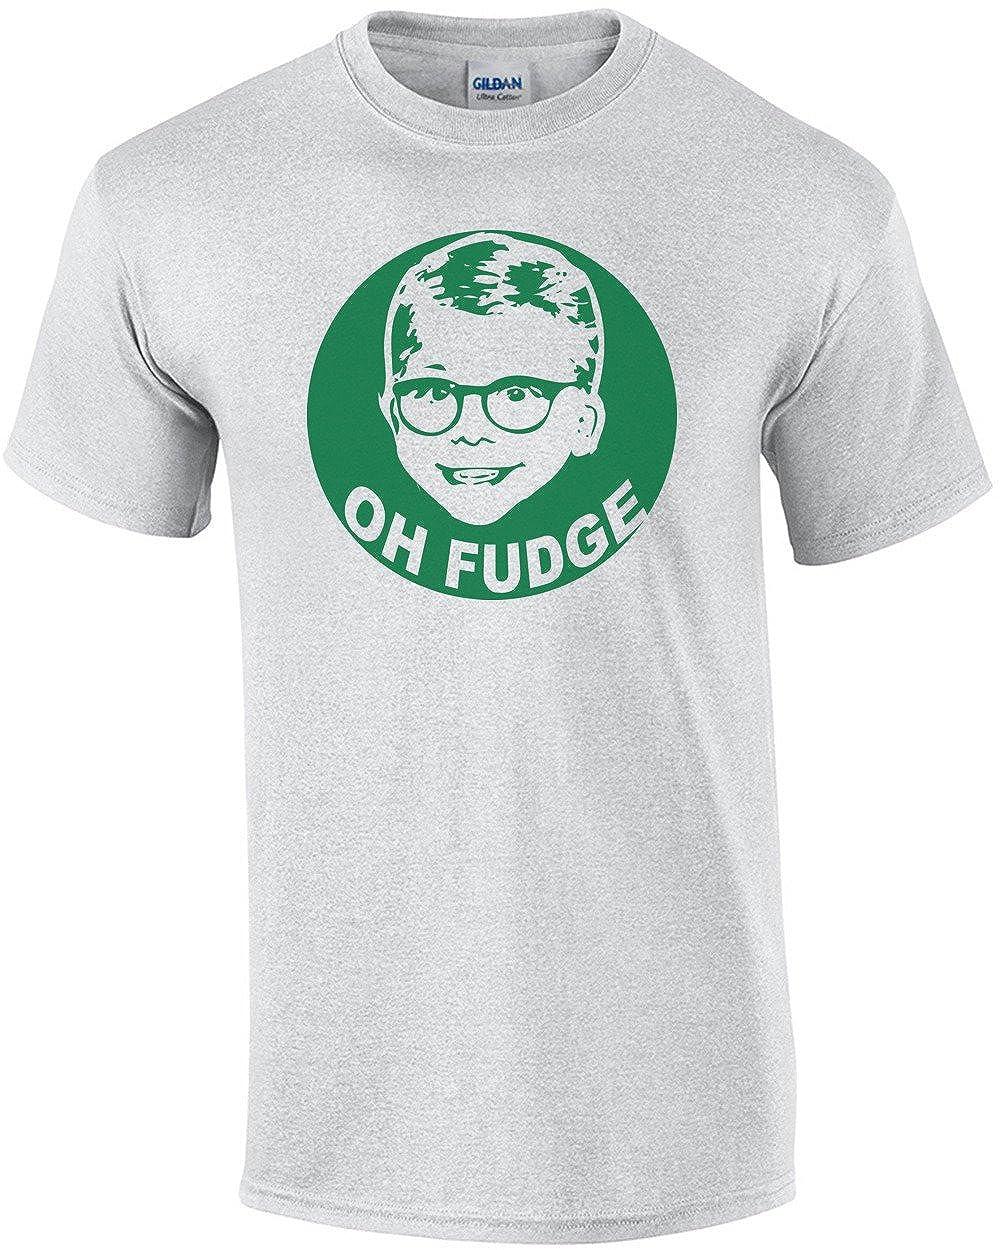 Amazon.com: Oh Fudge - A Christmas Story Shirt: Clothing